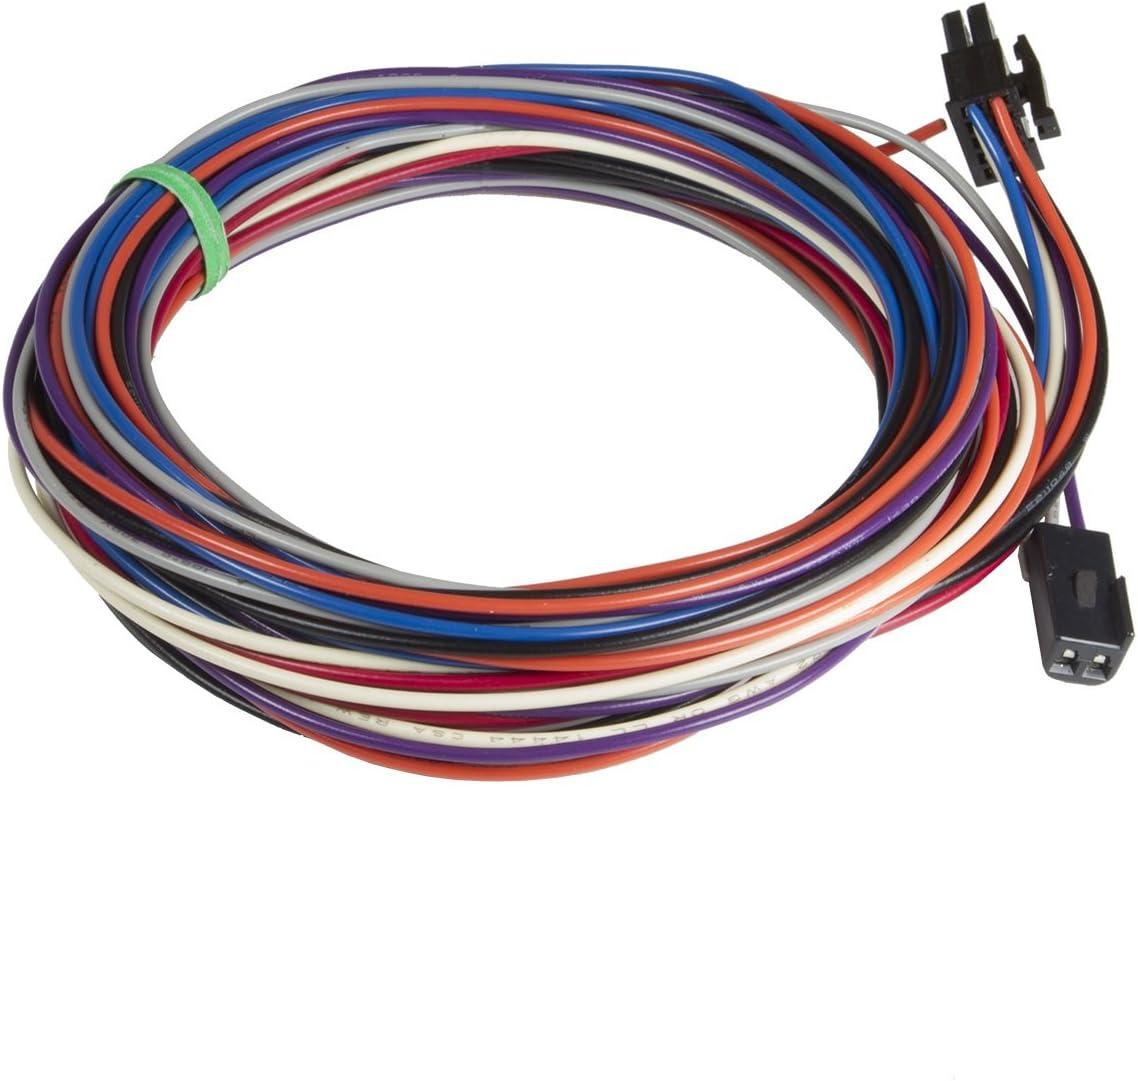 Amazon.com: Auto Meter 5276 Replacement Wire Harness for Elite Temperature  Gauges: AutomotiveAmazon.com